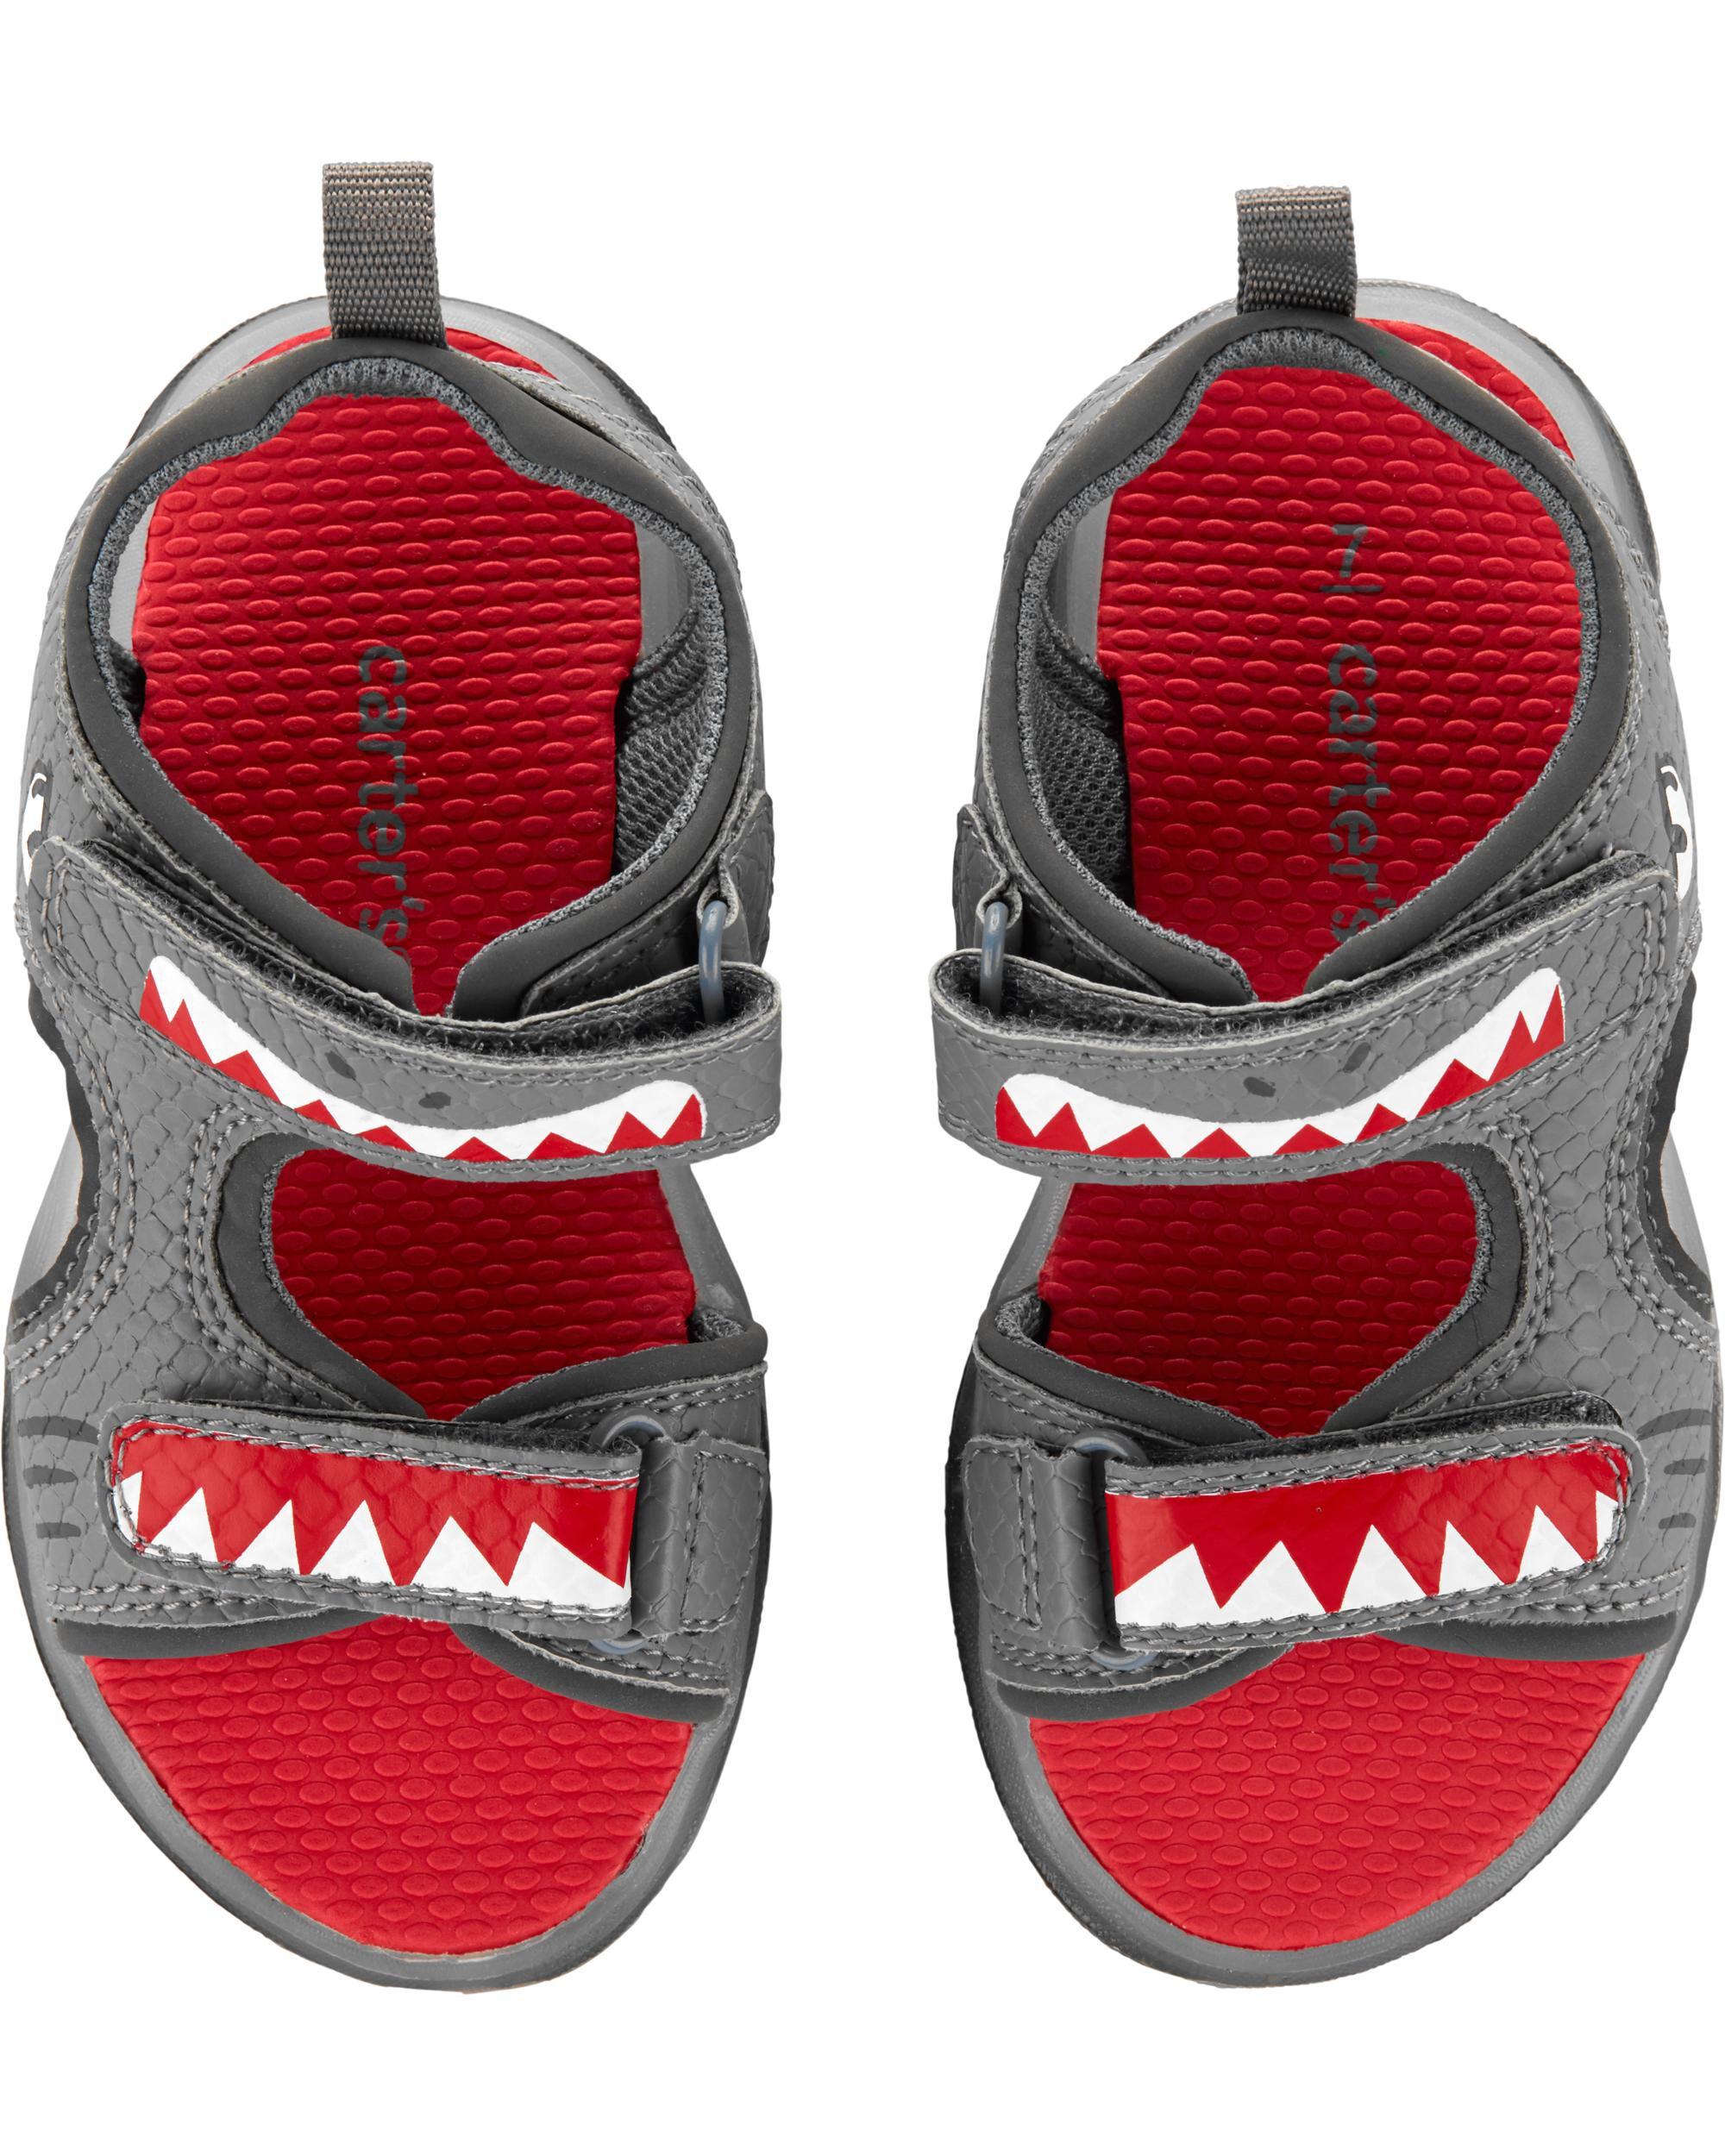 carters shark shoes